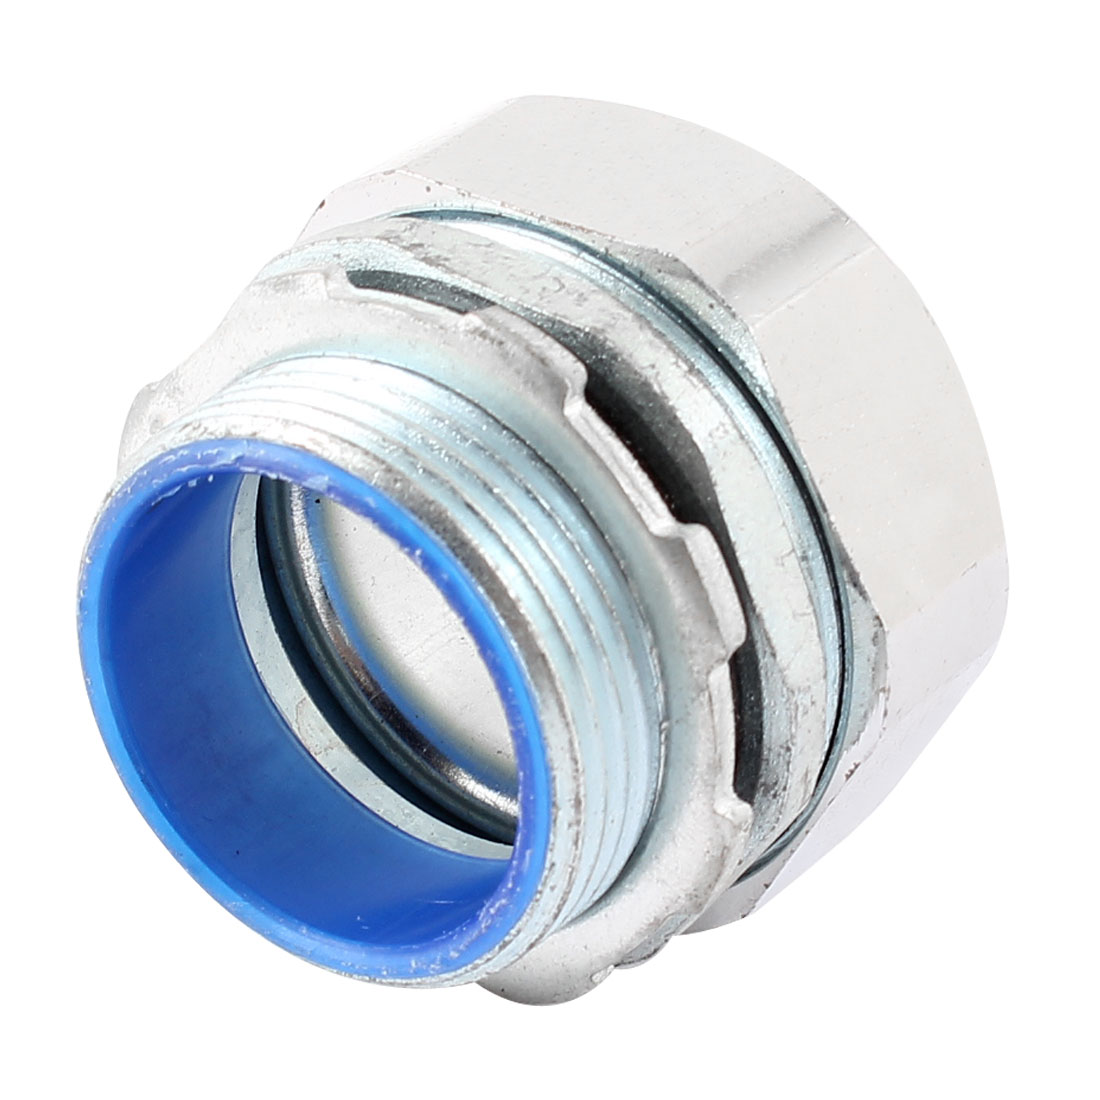 Silver Tone Metal 1 1/4 PT Male Thread Flexible Liquid Tight Connector